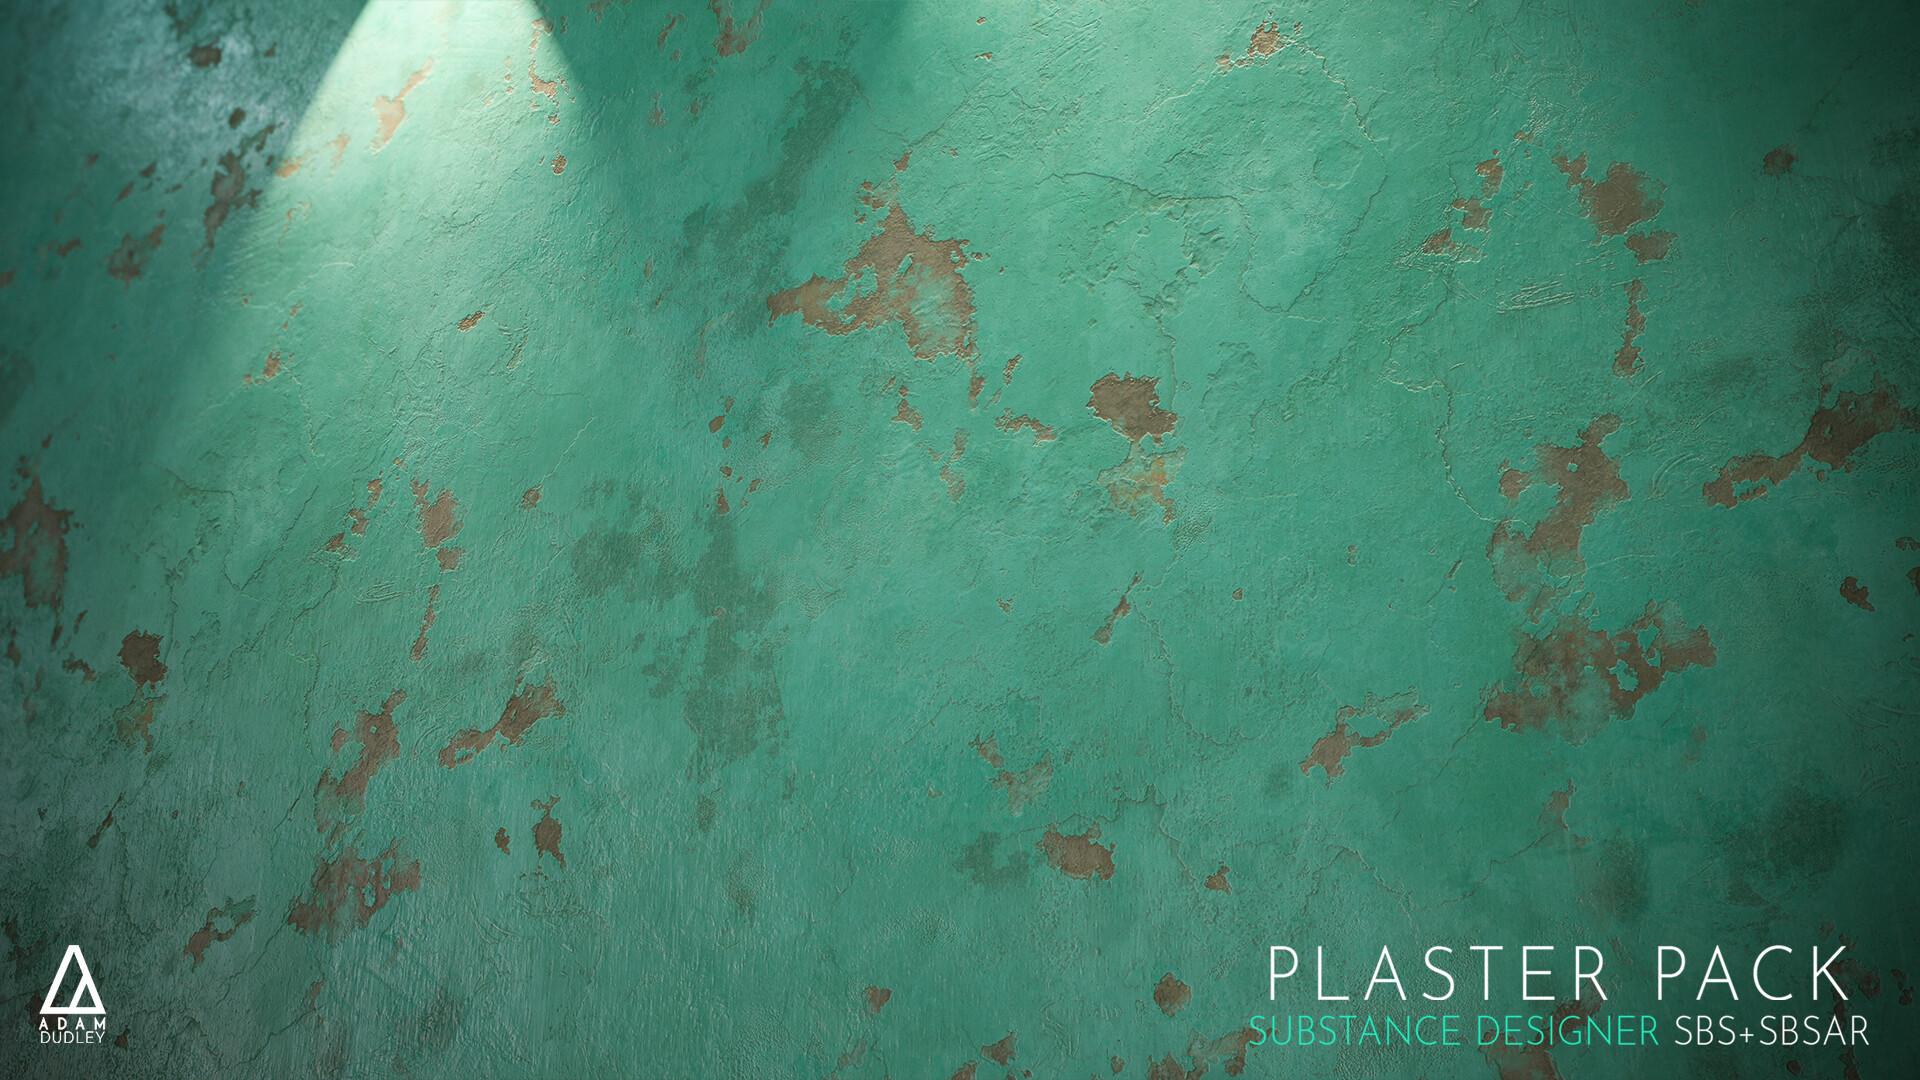 Adam dudley x plasterpack 02